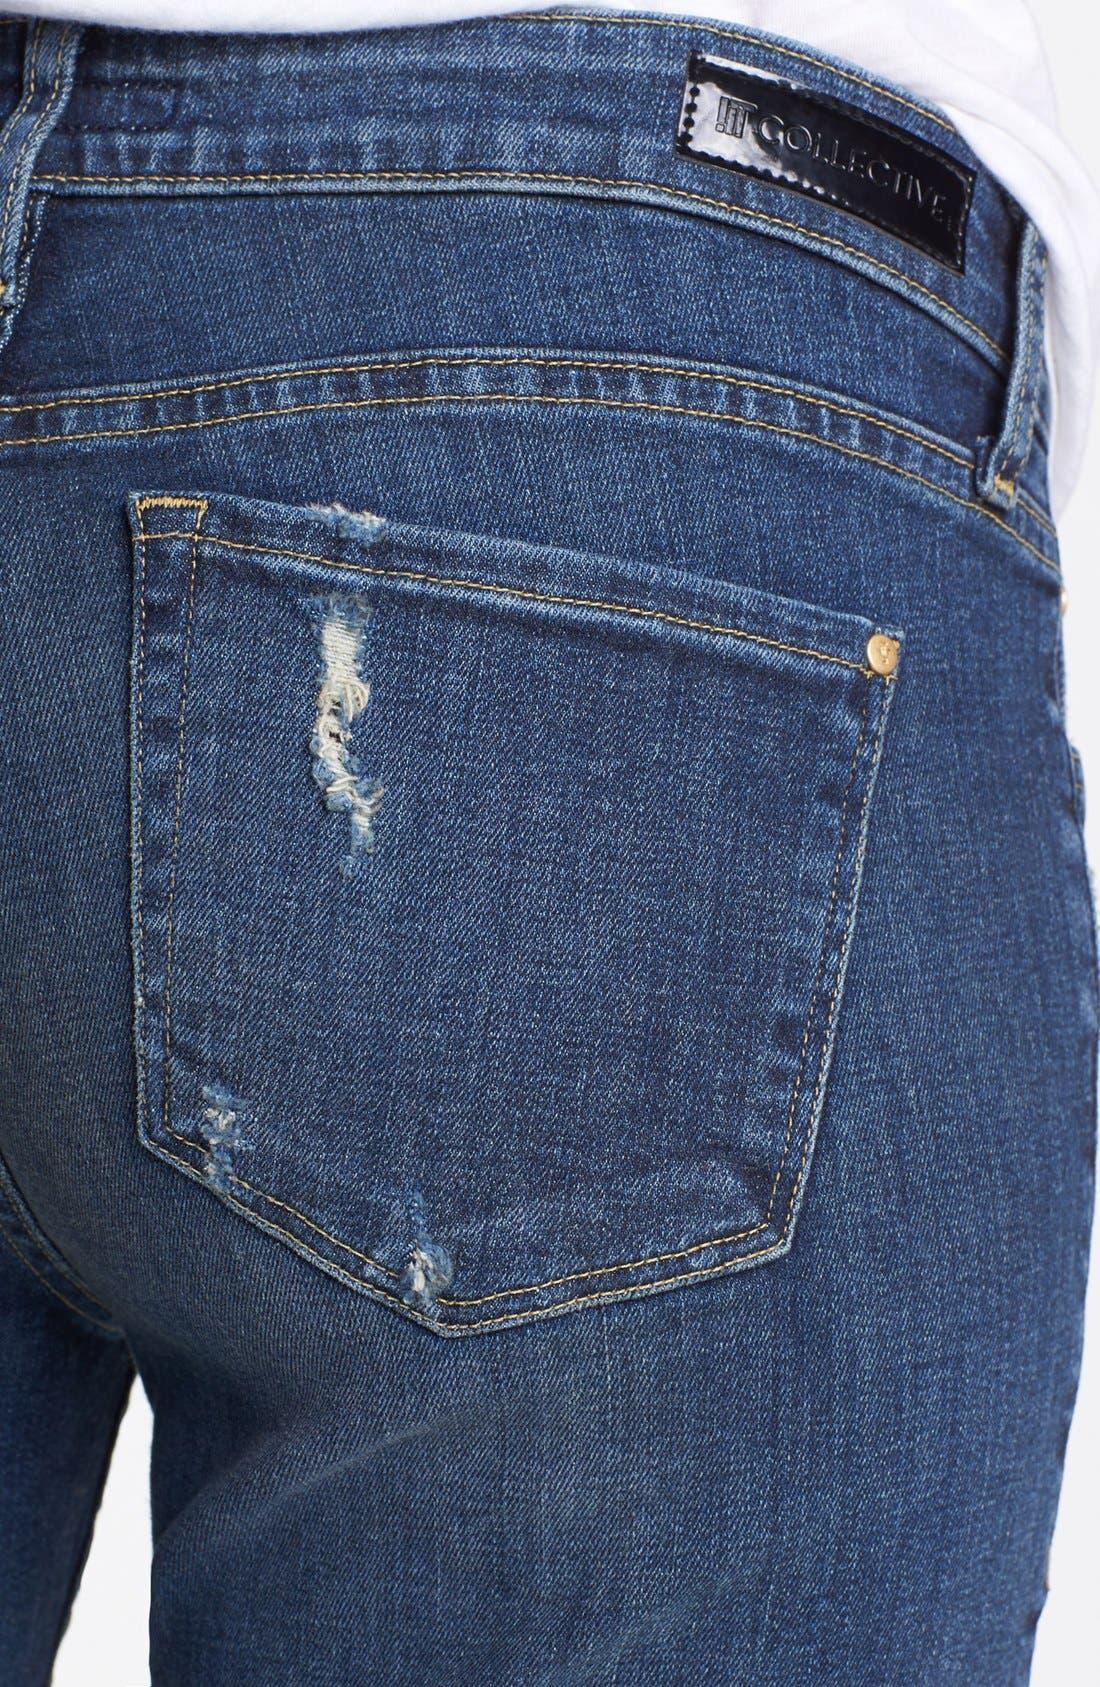 Alternate Image 3  - !iT Collective 'Hepburn' Stretch Boyfriend Jeans (Mac Coy)